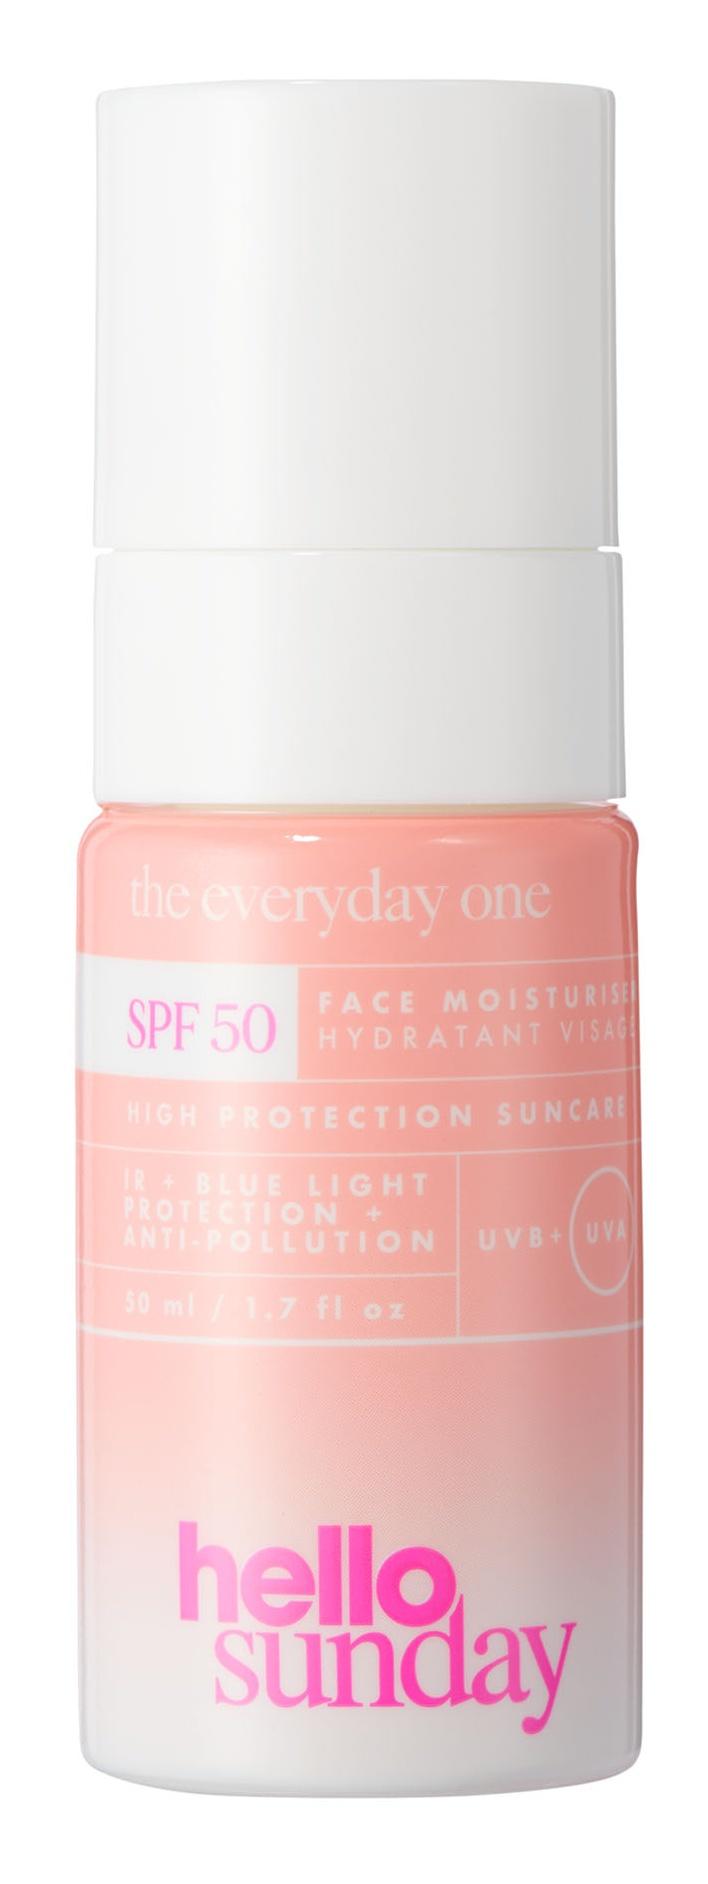 Hello Sunday The Everyday One - Face Moisturiser SPF 50